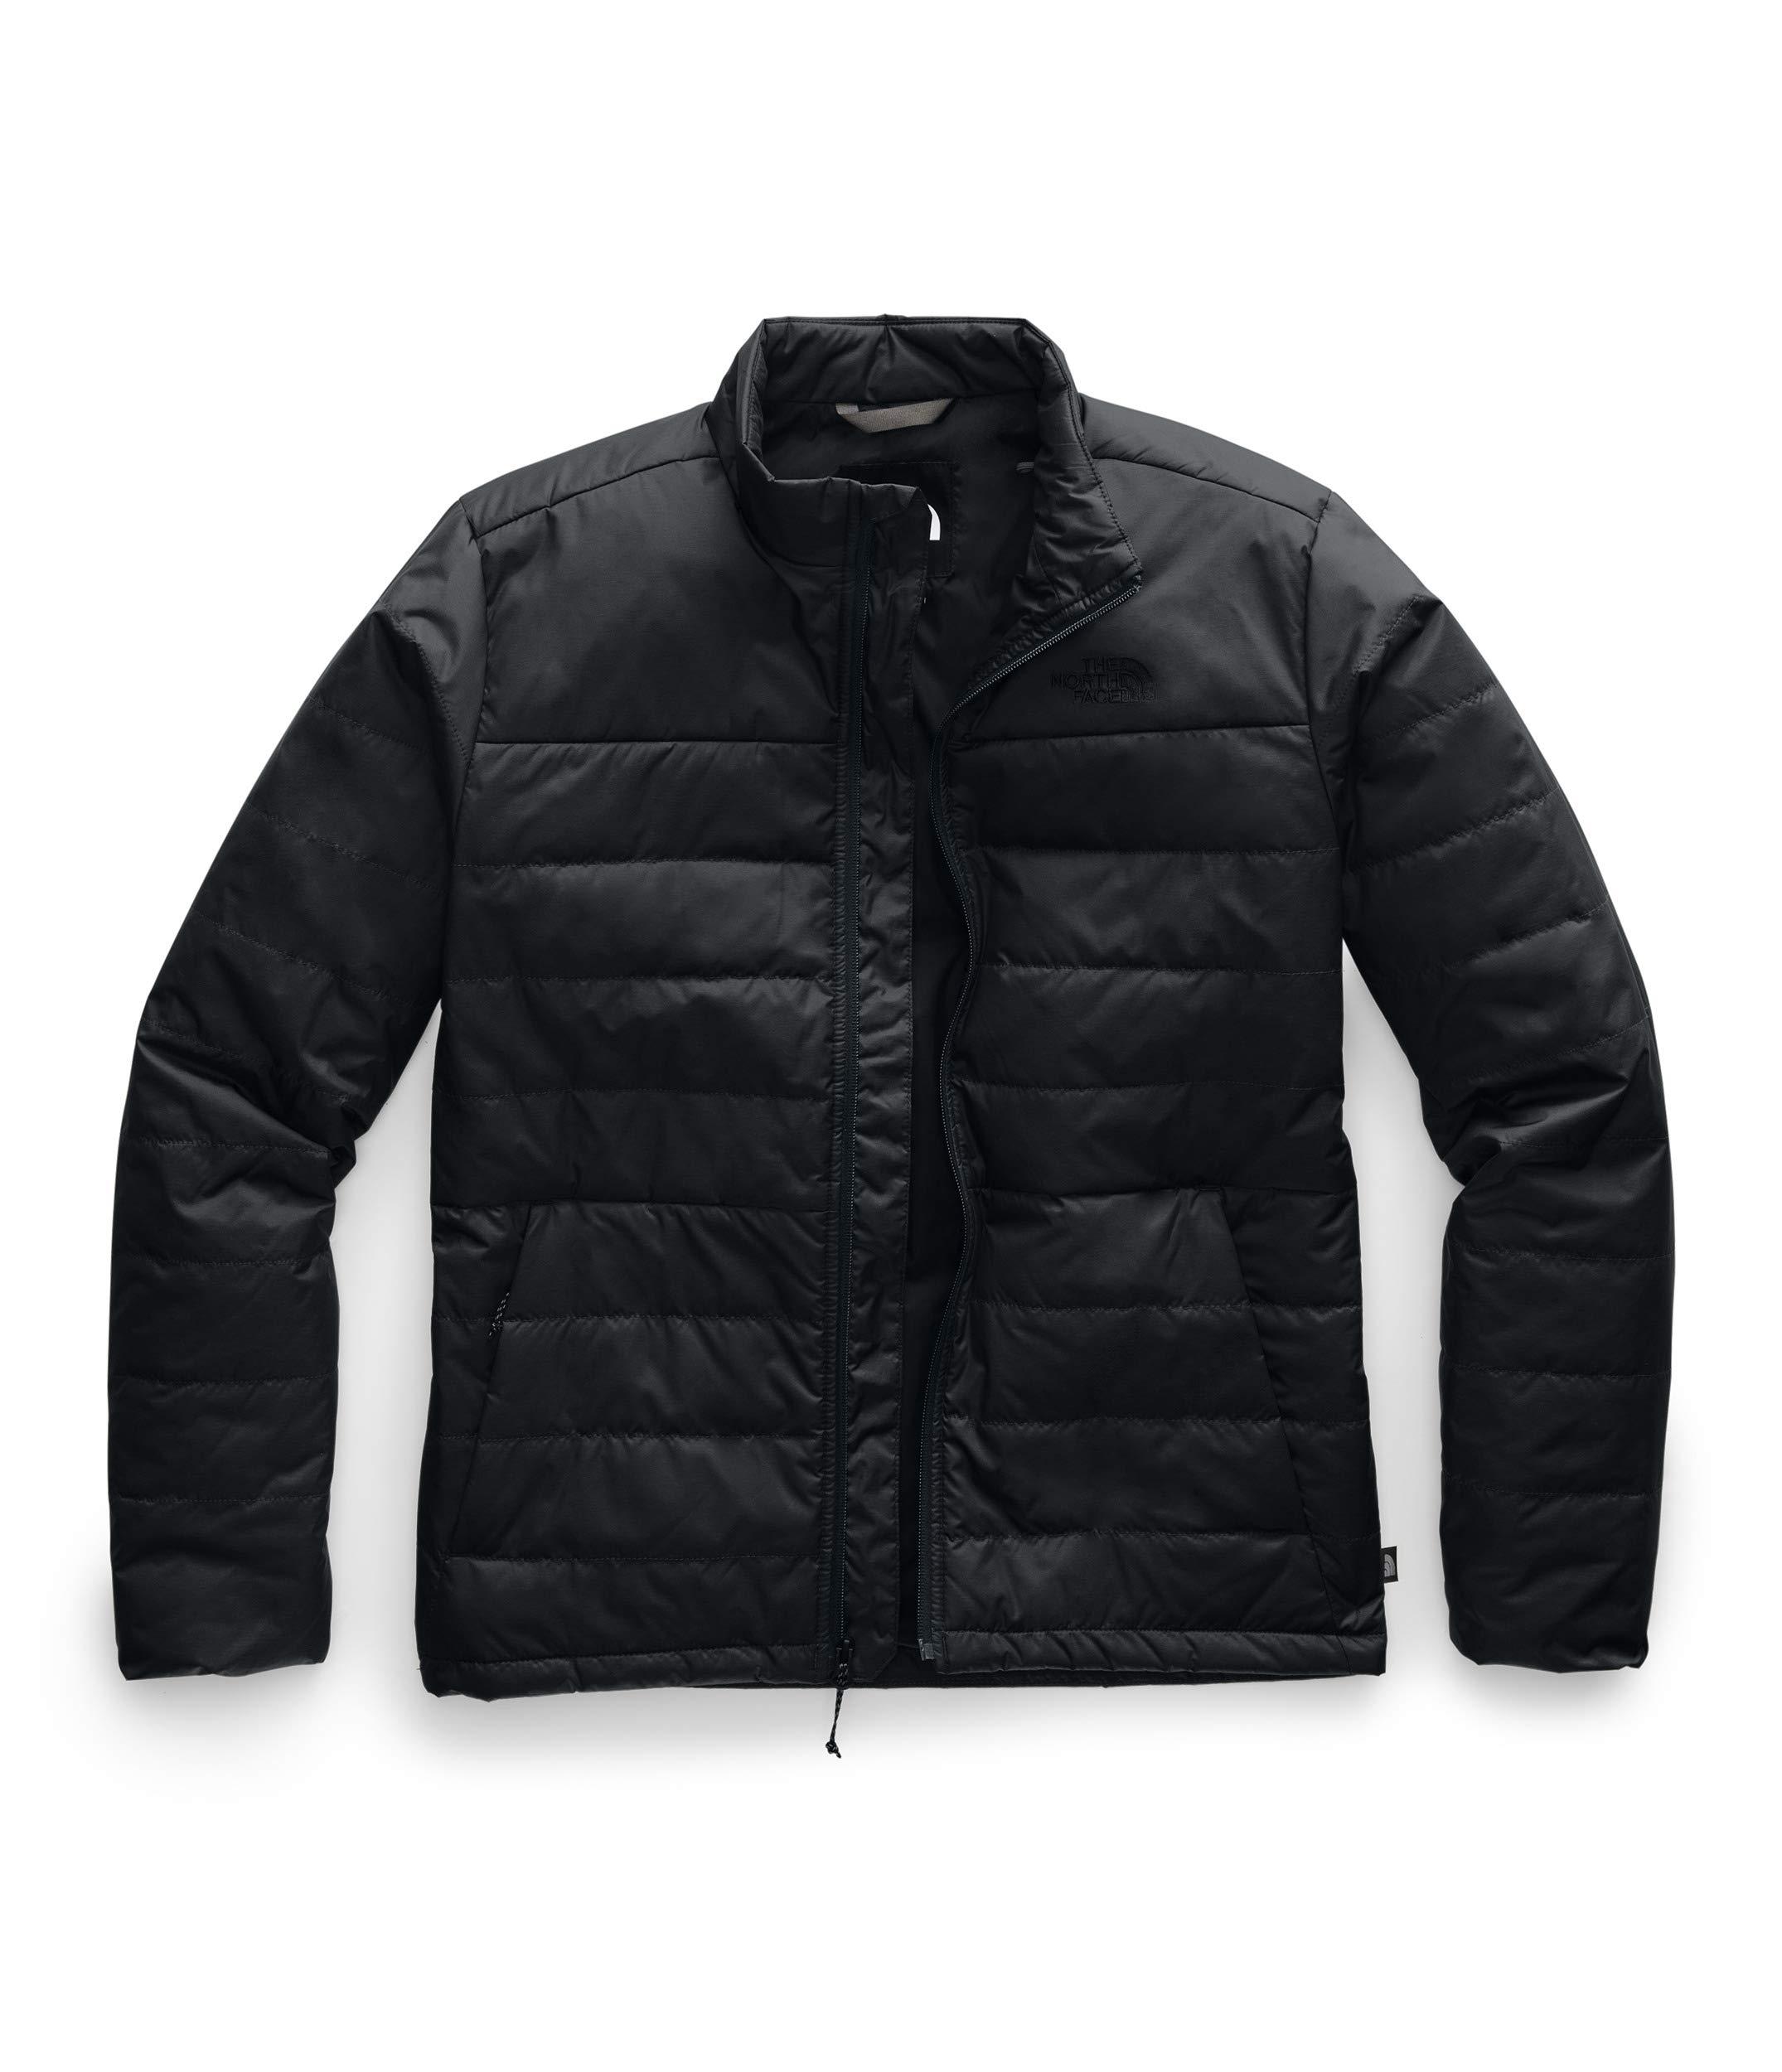 North Face Mens Bombay Jacket